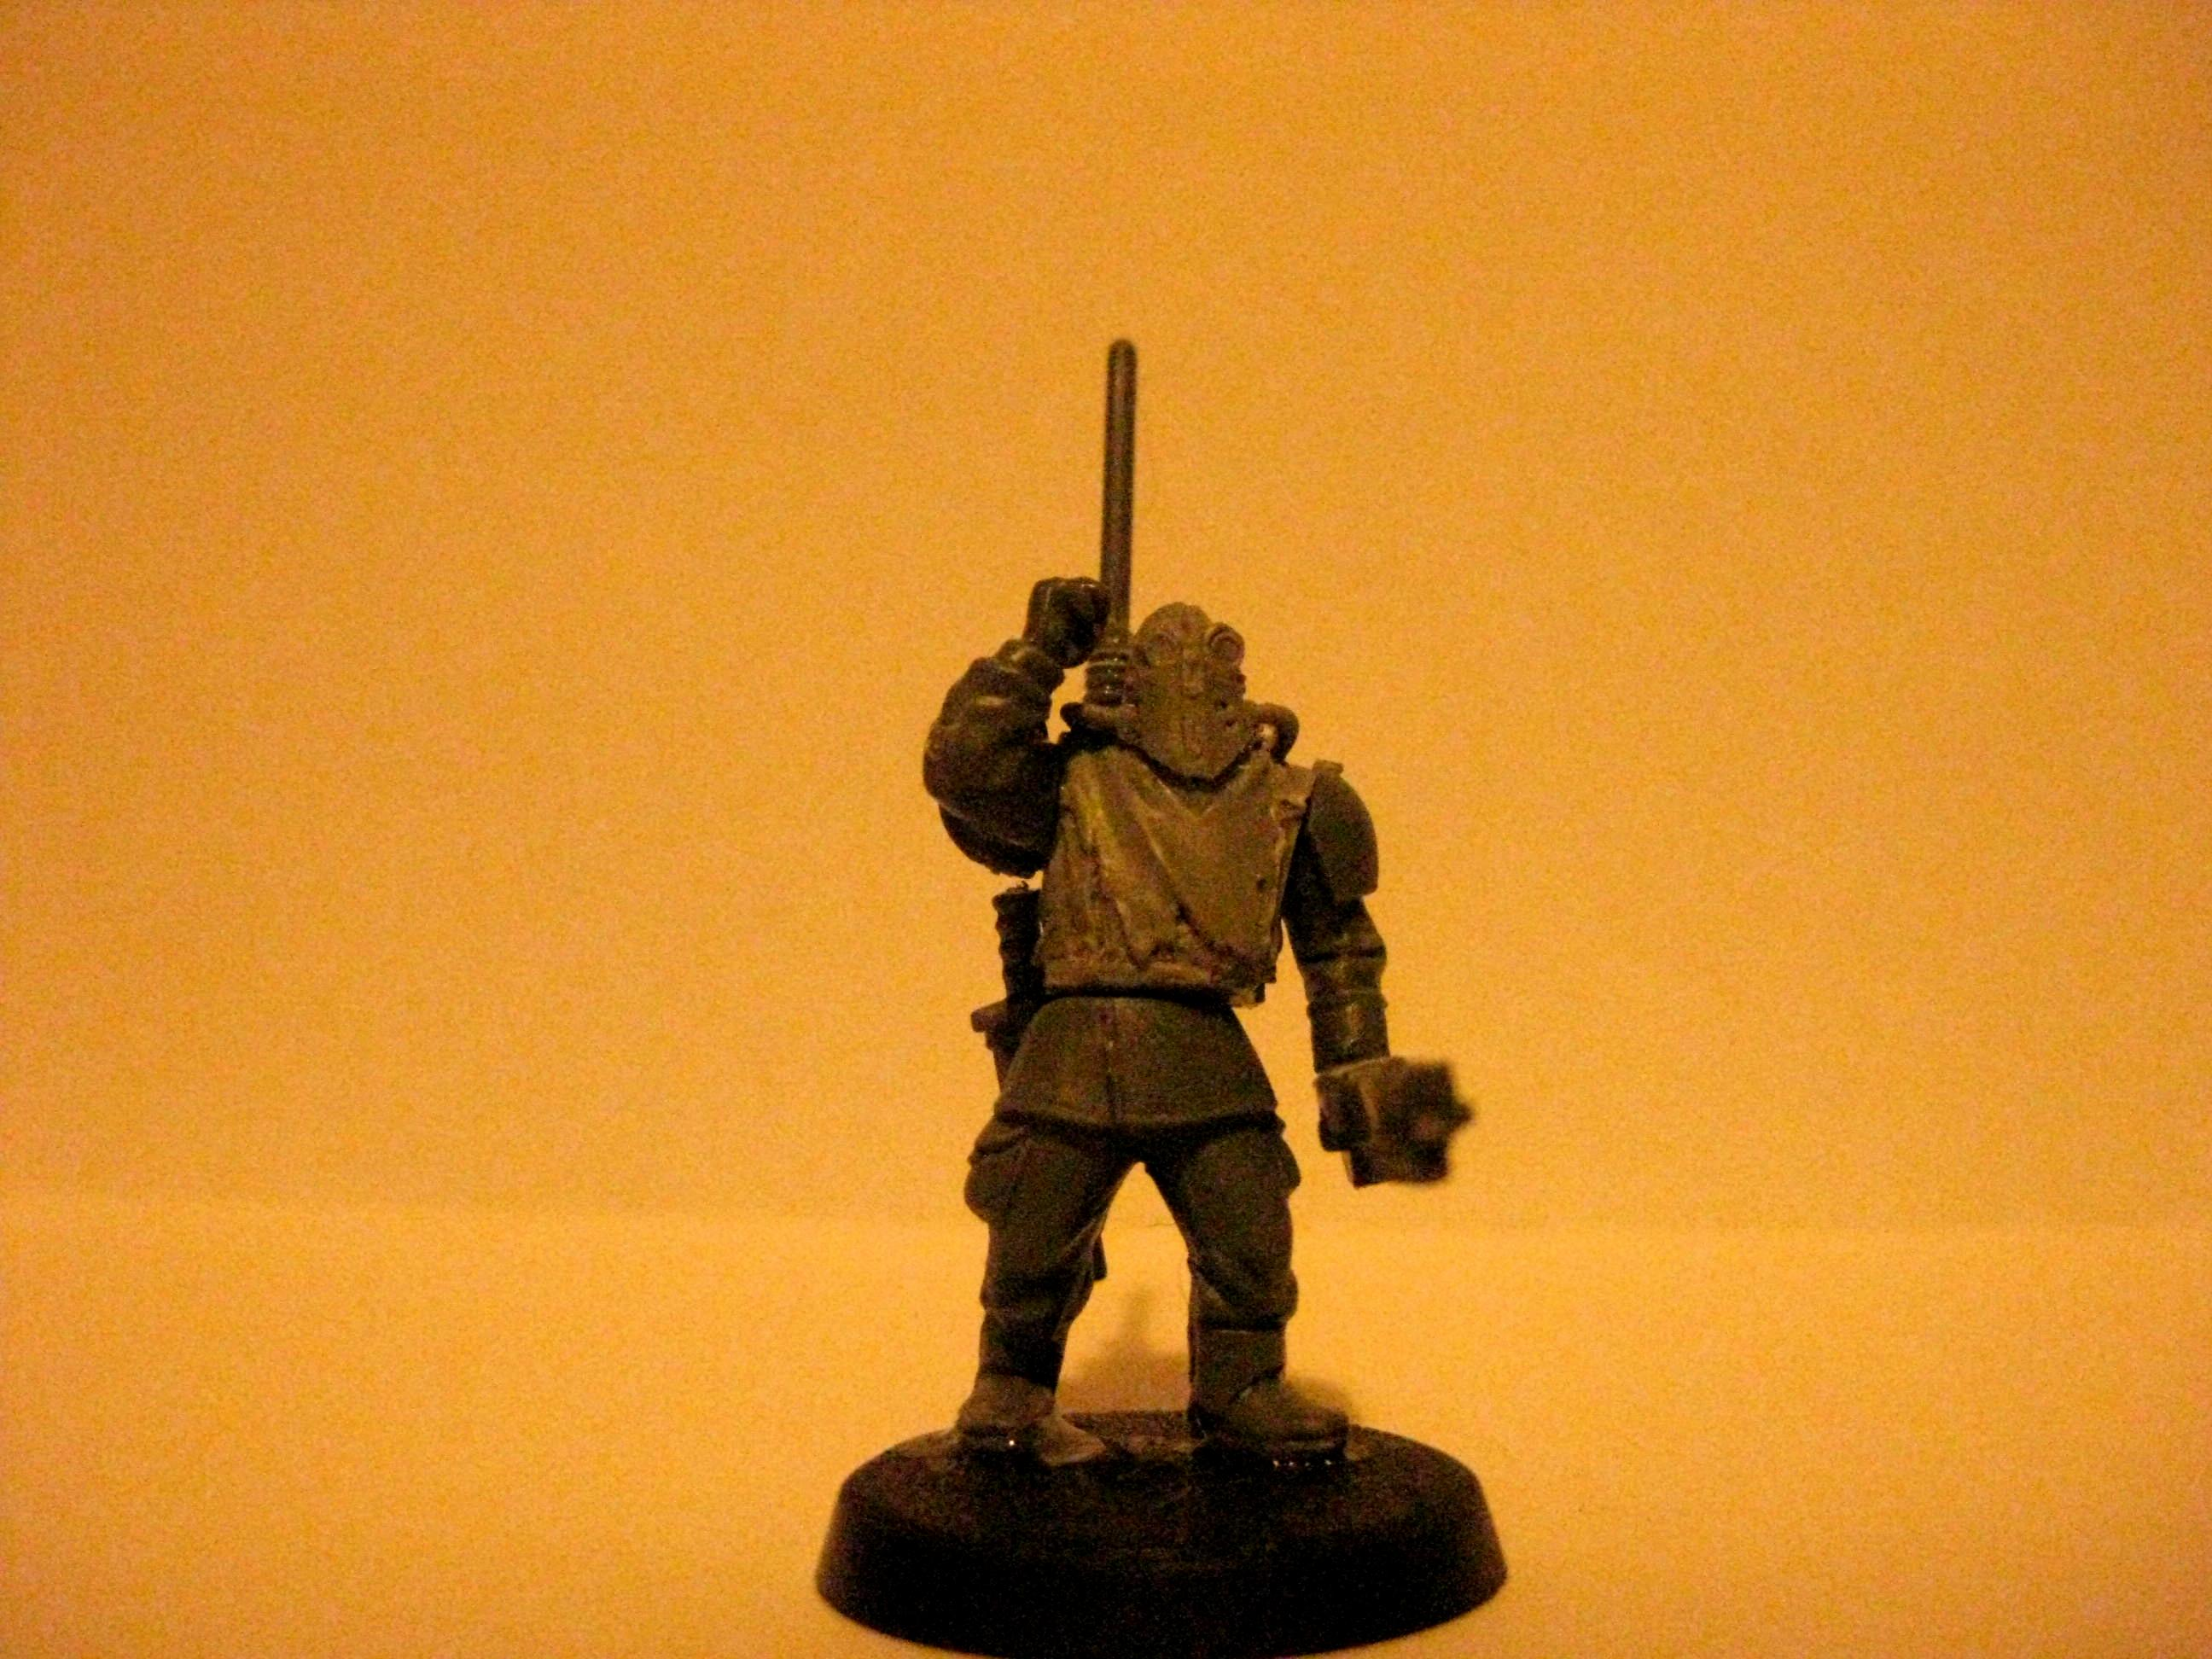 Chaos, Cornish, Heretics, Rebels, Renegades